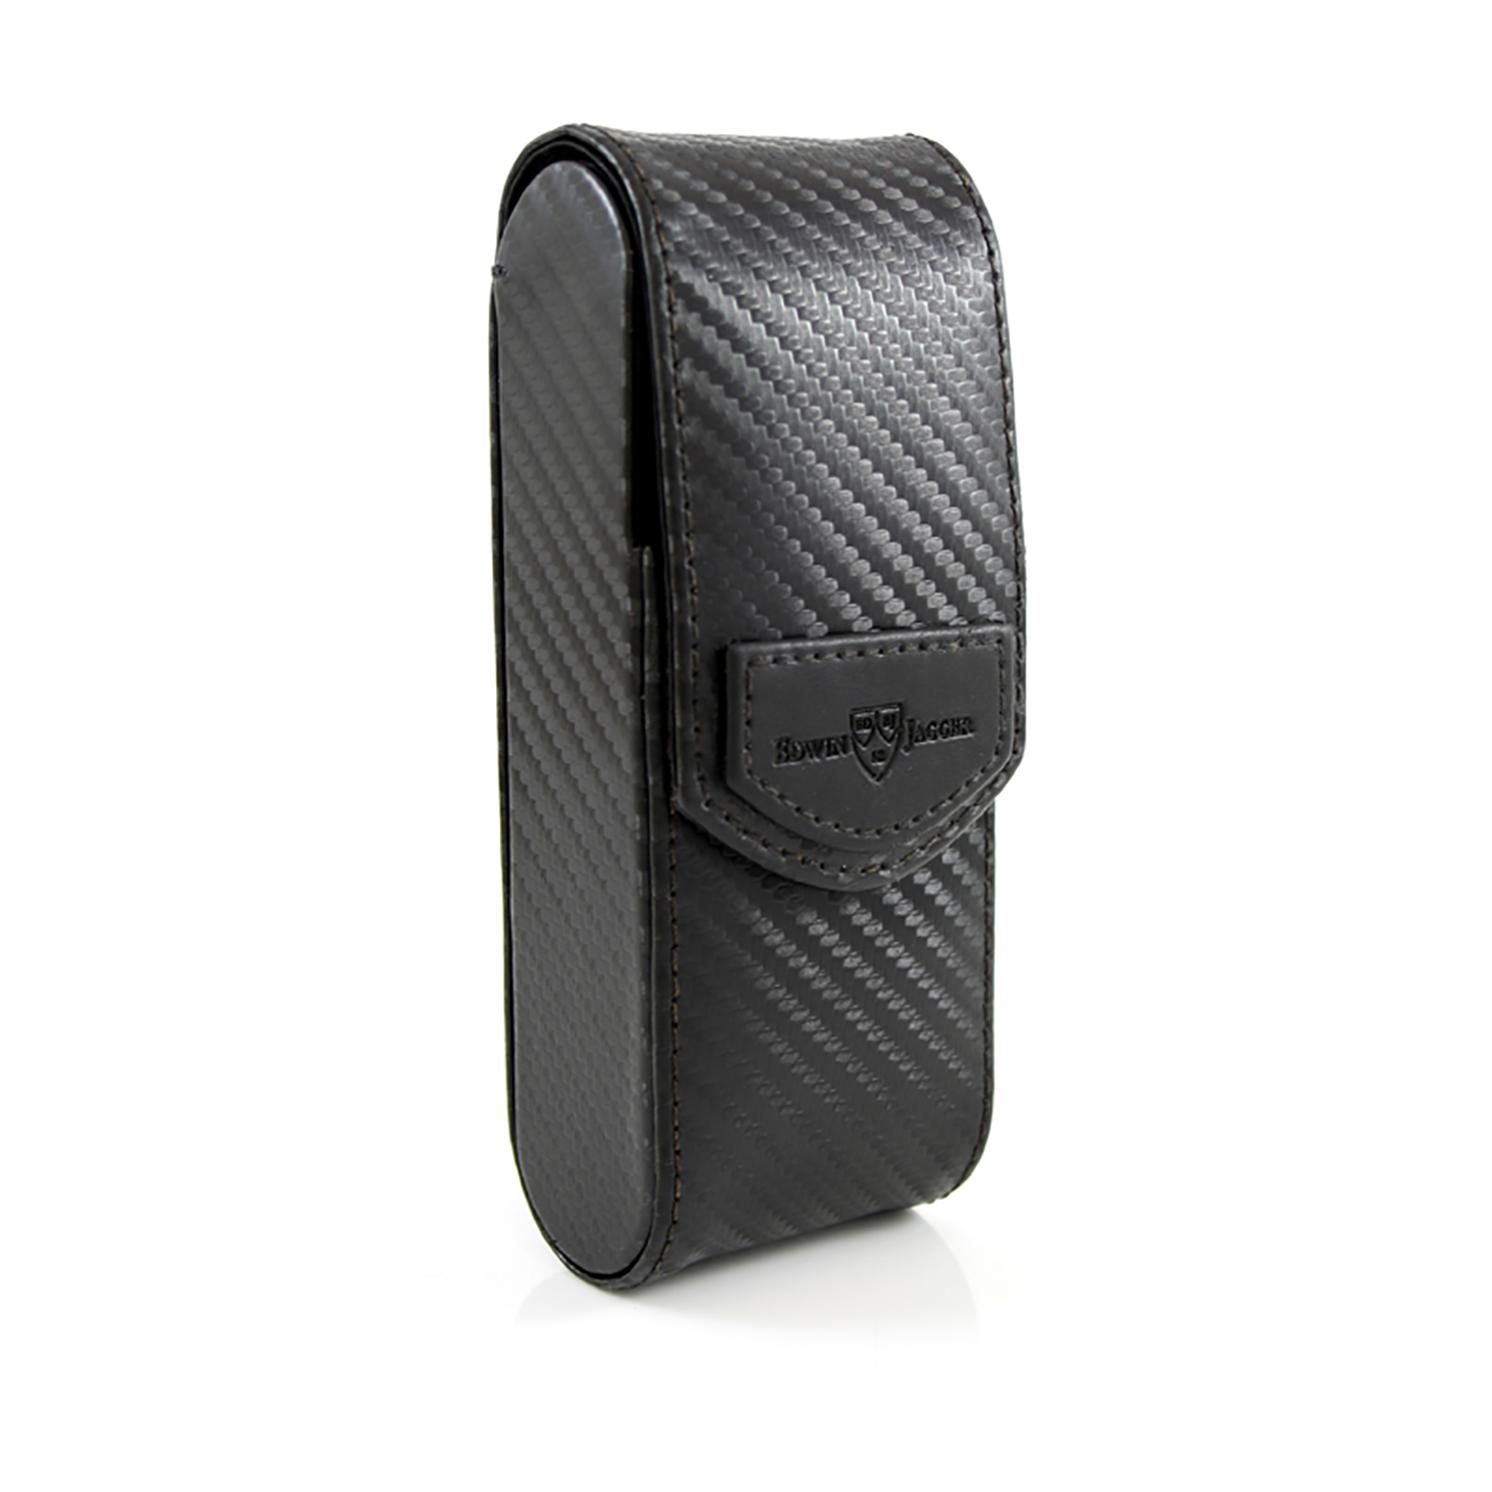 Edwin Jagger – Black Carbon Fibre Effect Textured Razor Travel Case in Gift Box